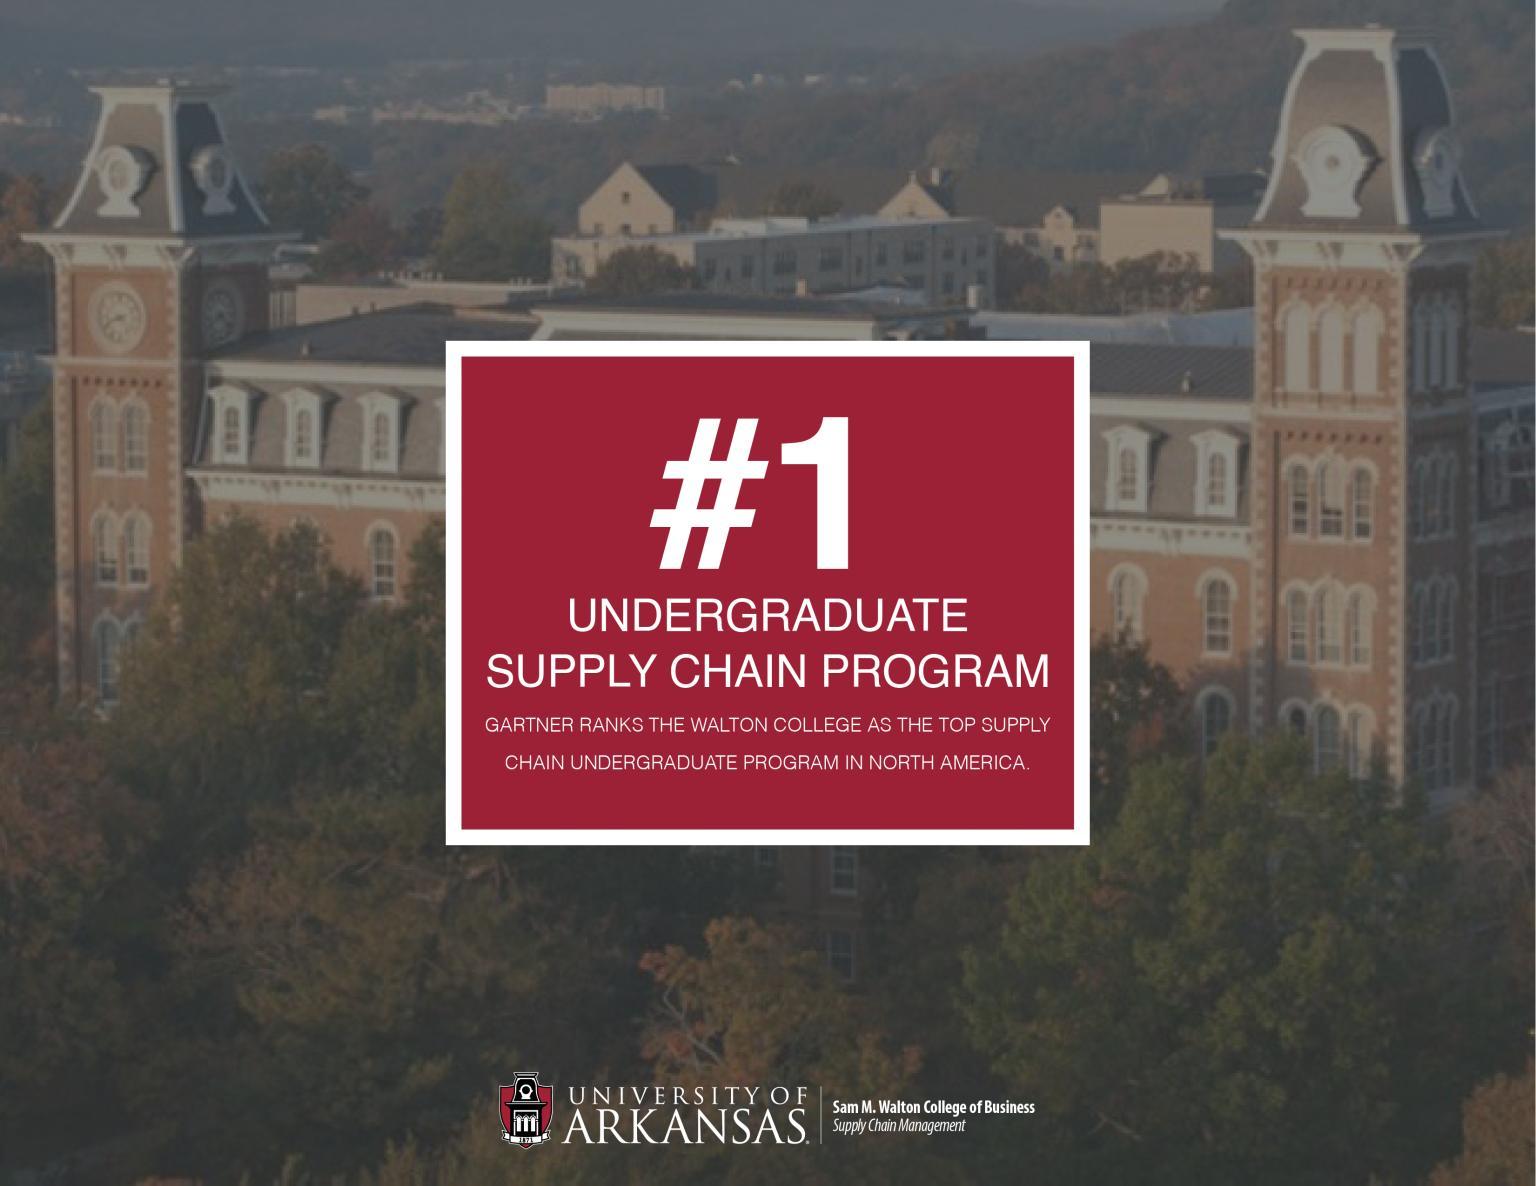 University of Arkansas named #1 undergraduate supply chain program in North America!